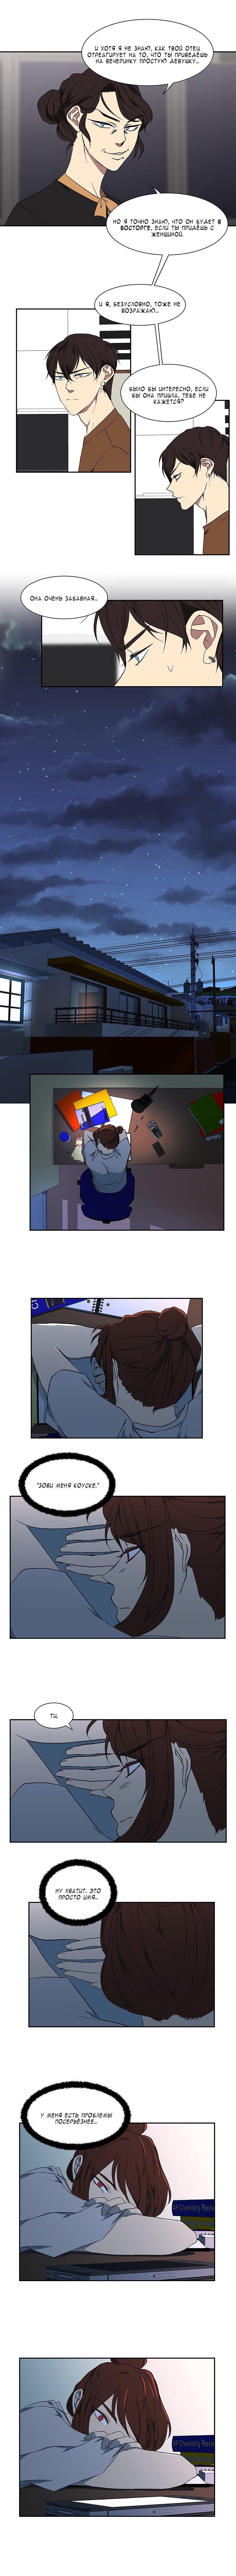 Манга Я люблю Ю / I love Yoo  - Том 1 Глава 42 Страница 6